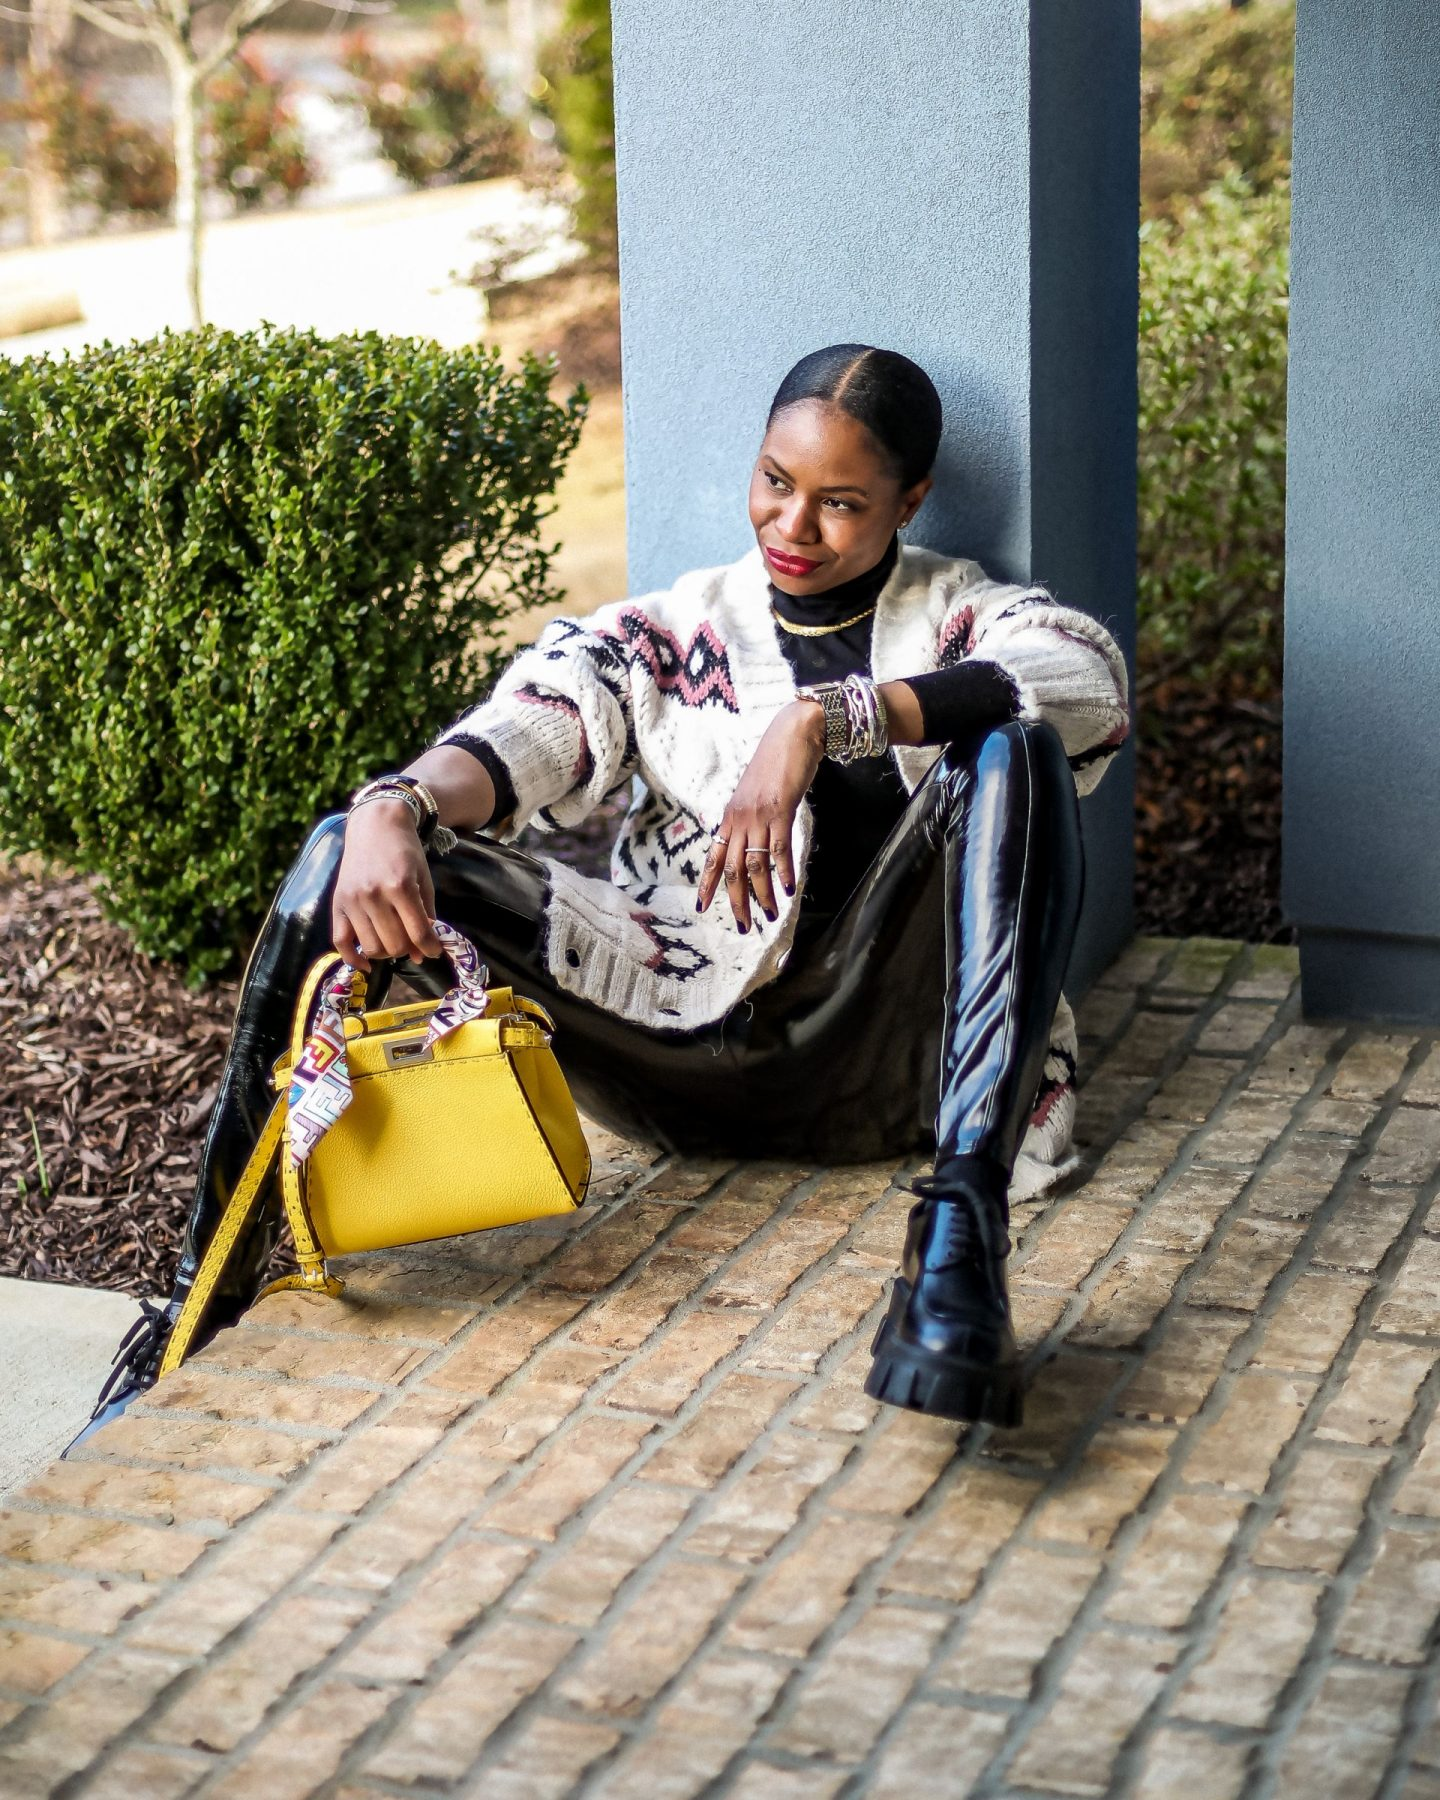 fendi, fendi yellow peekaboo bag, cuoio romano leather, zara sweater, patent leather pants, faux leather leggings, spanx leggings, prada shoes